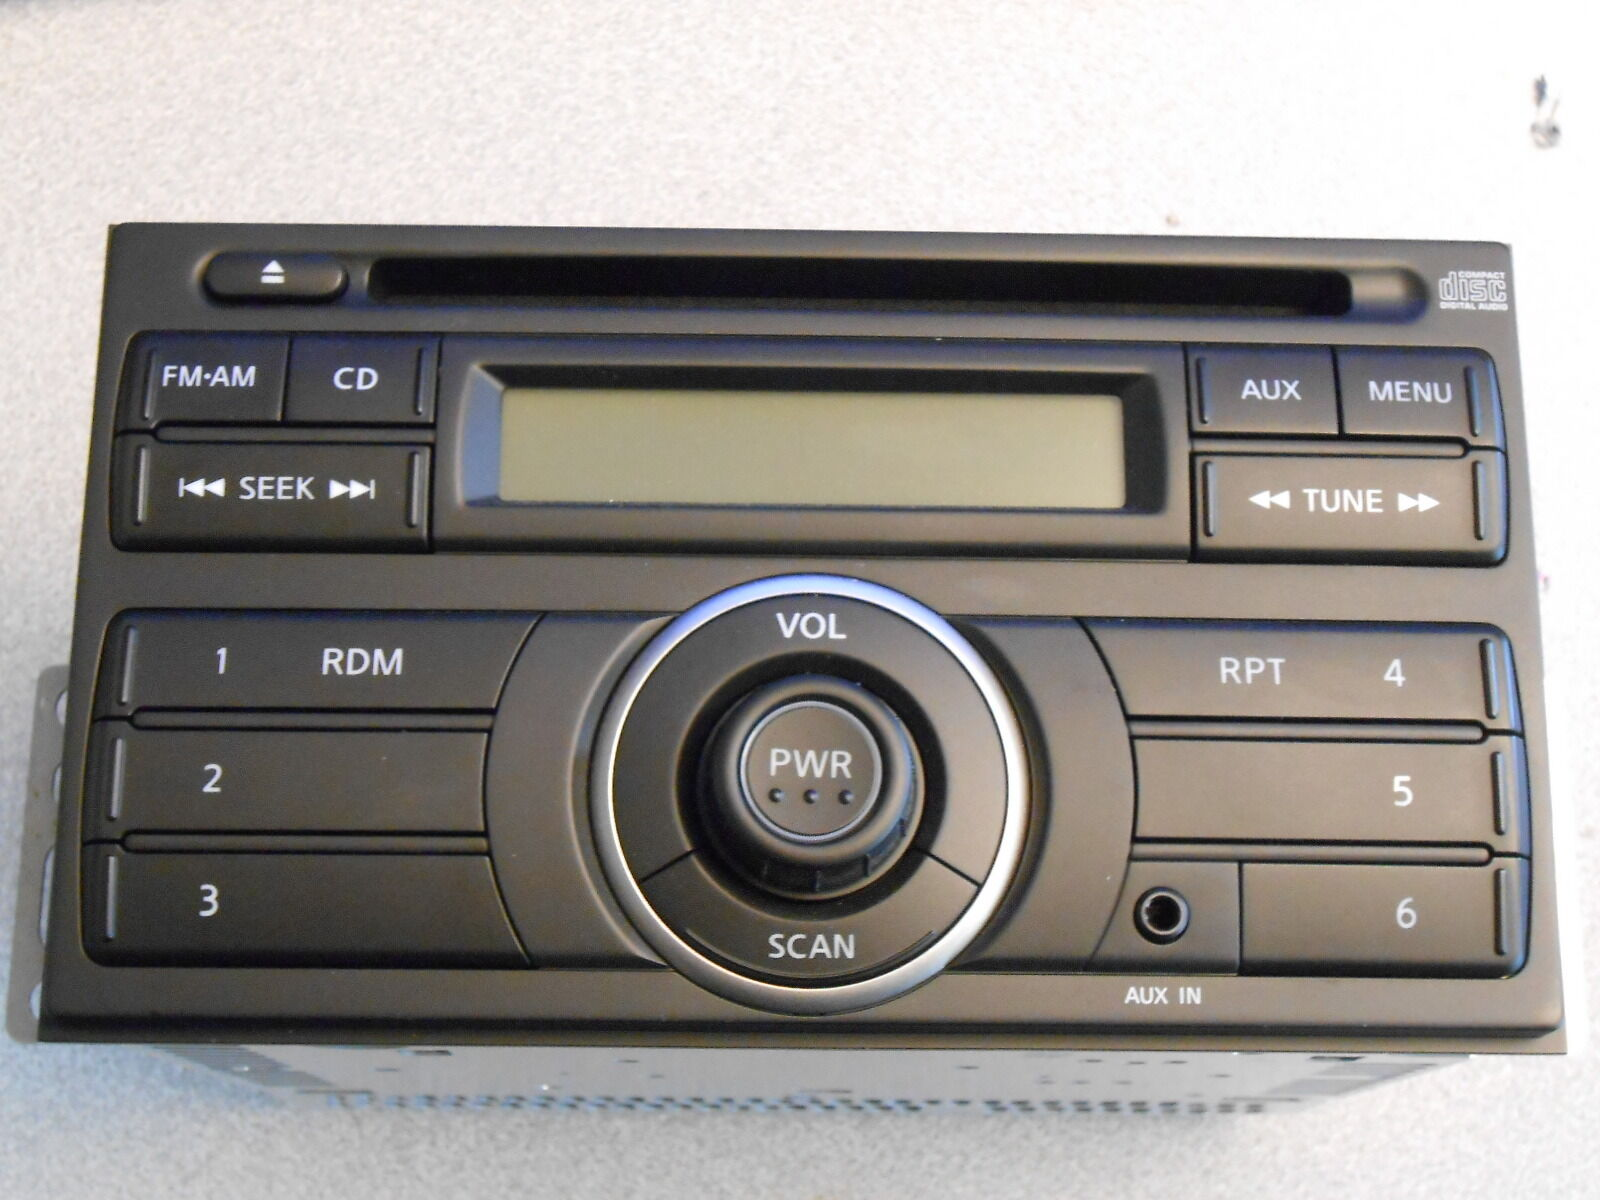 2012 Nissan Cube NV Factory Car Radio Am / FM CD Player OEM Clarion ...